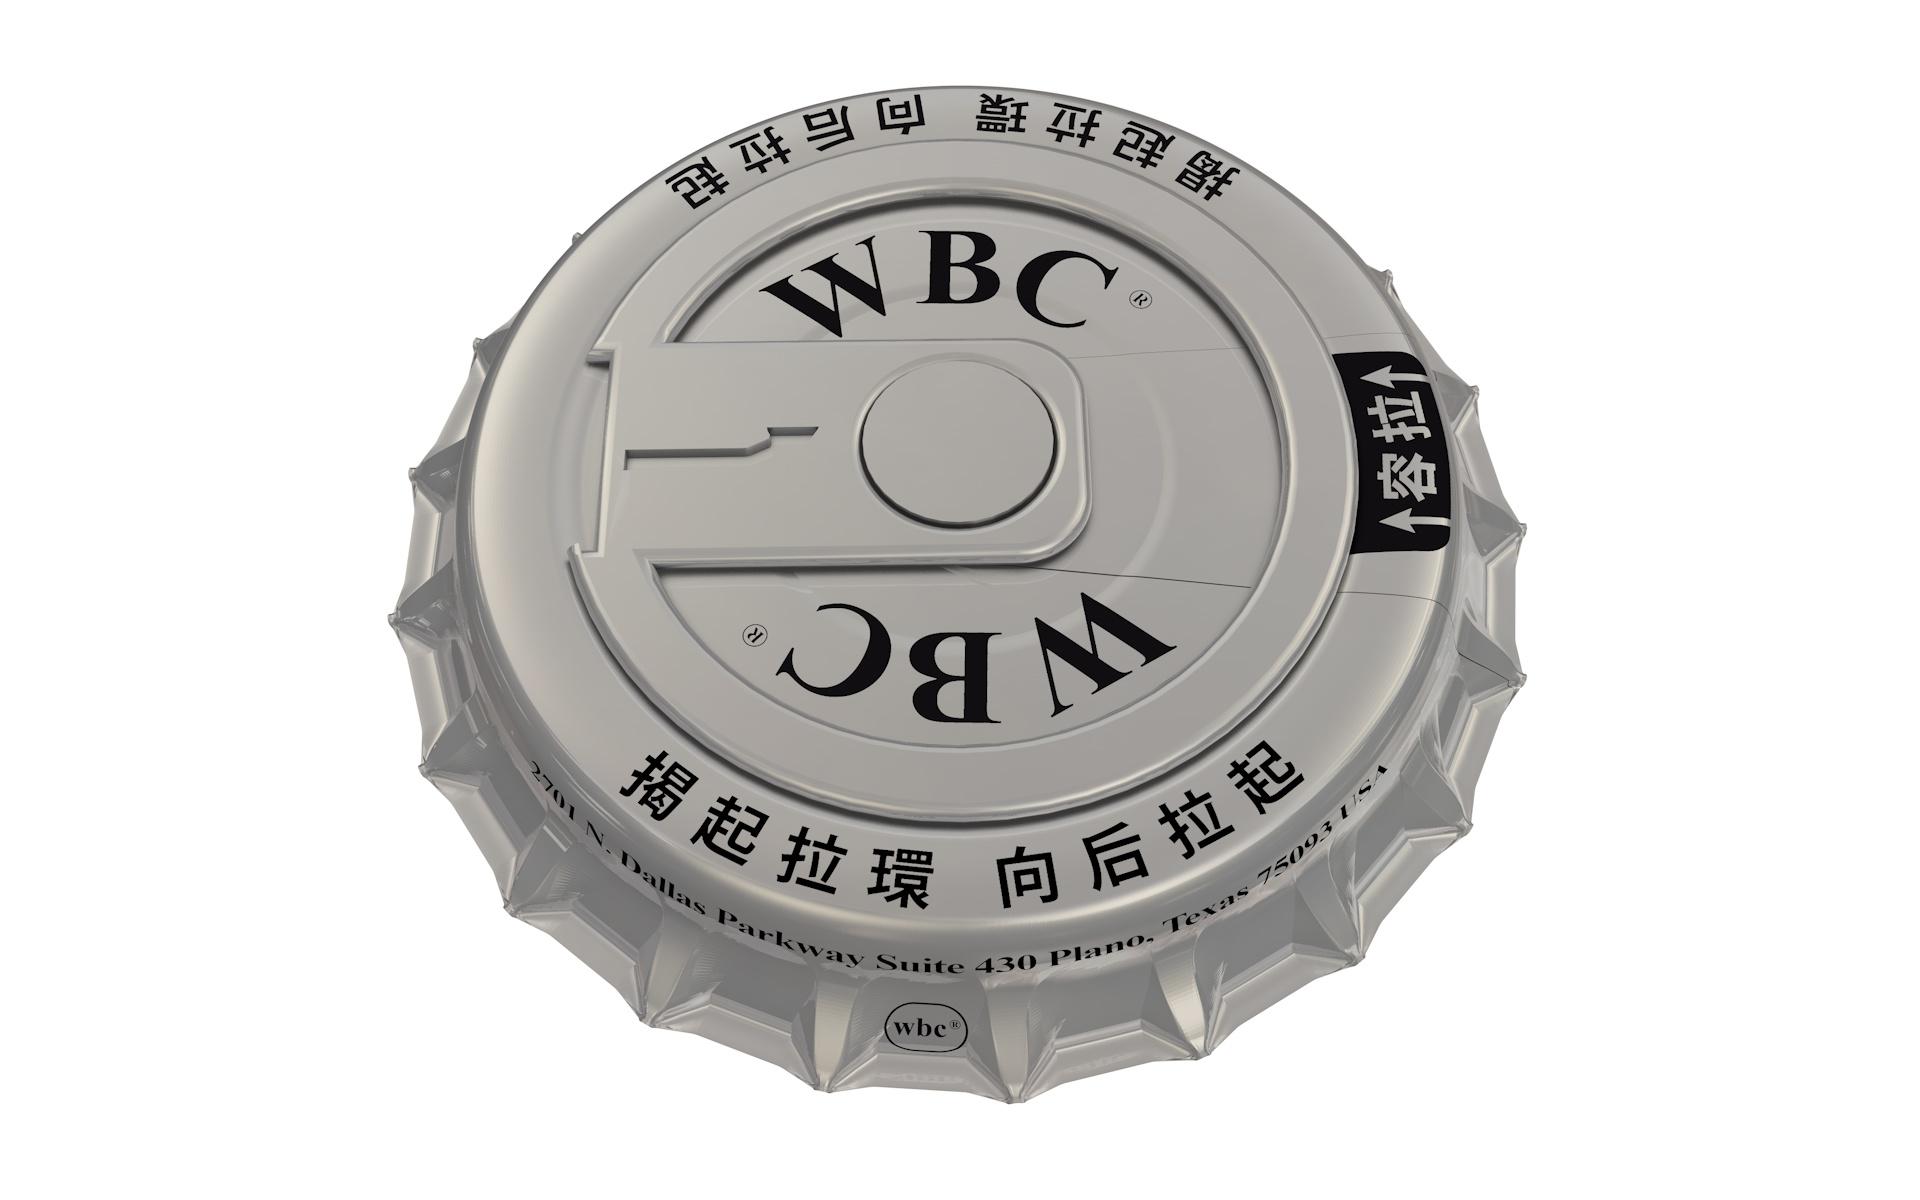 epbc-wbc-lift-ar-chi-001_0000